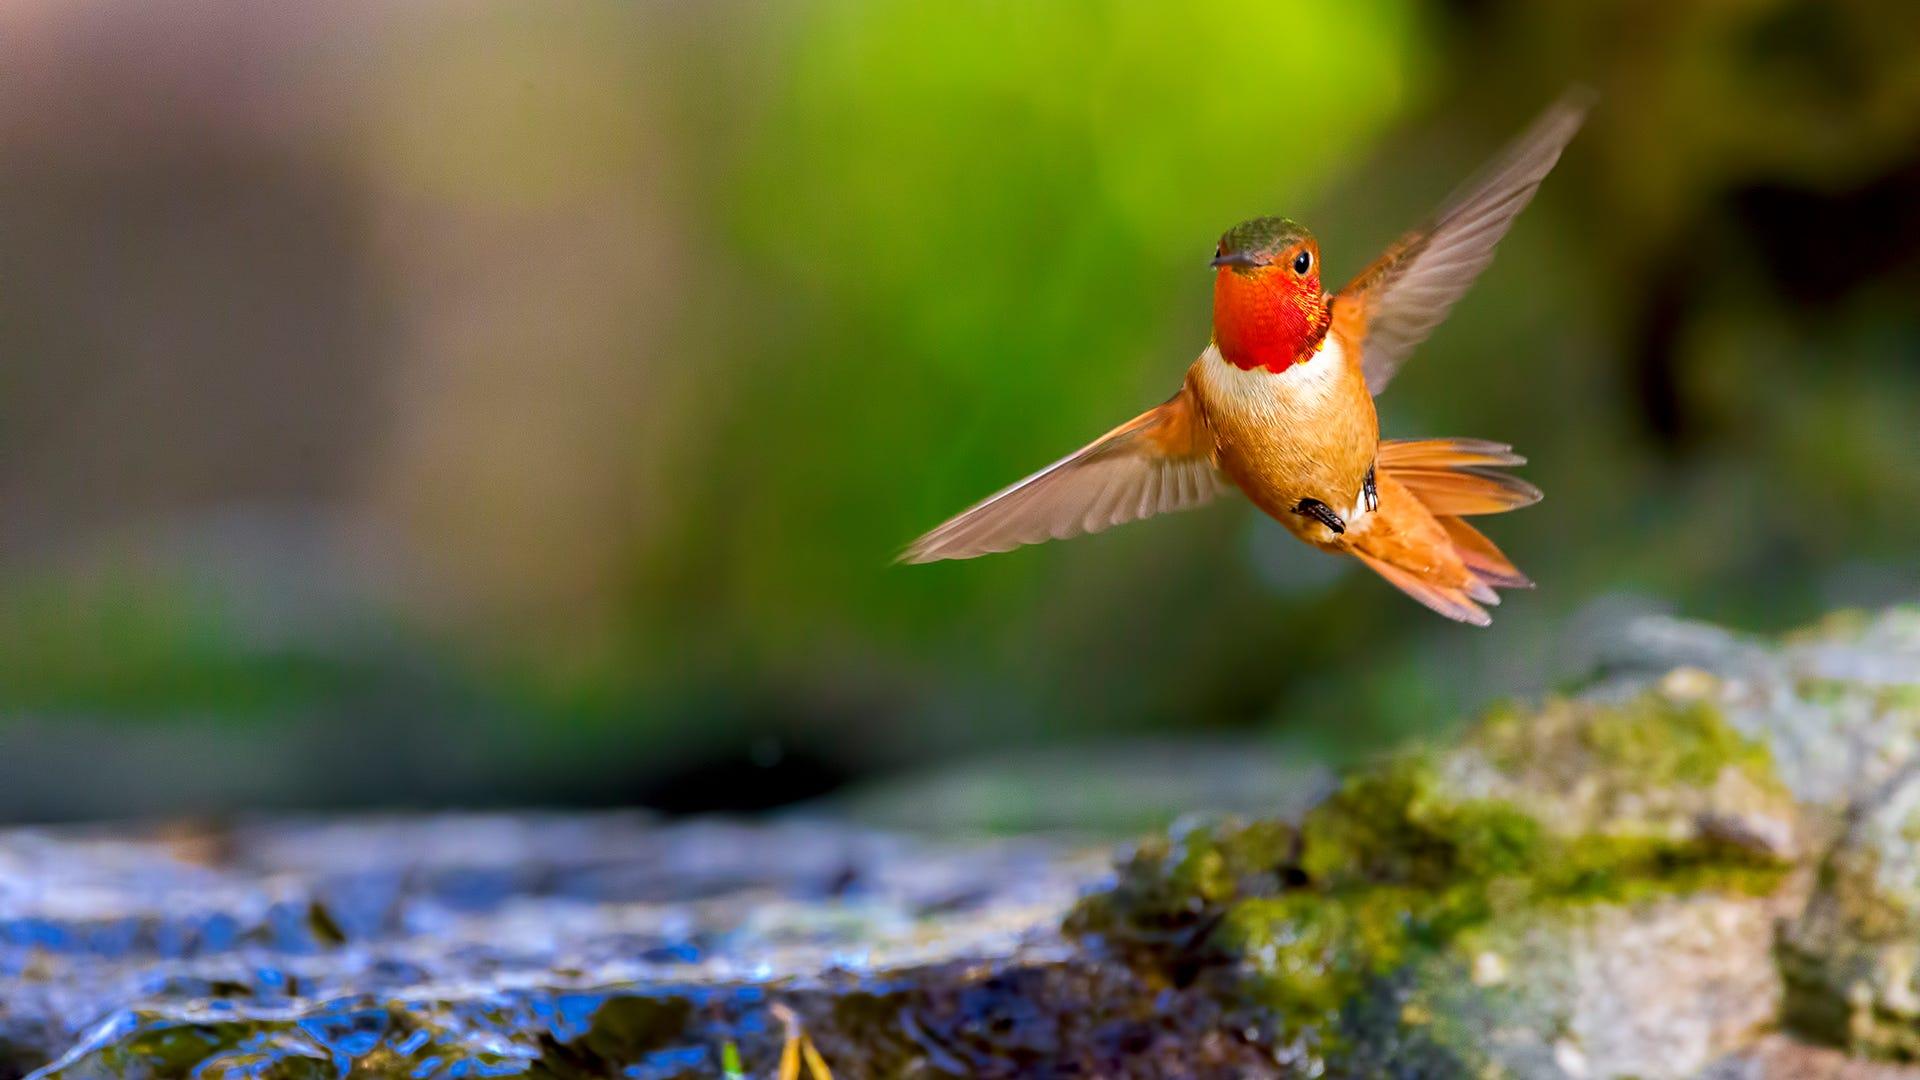 How to Help Hummingbirds Migrate